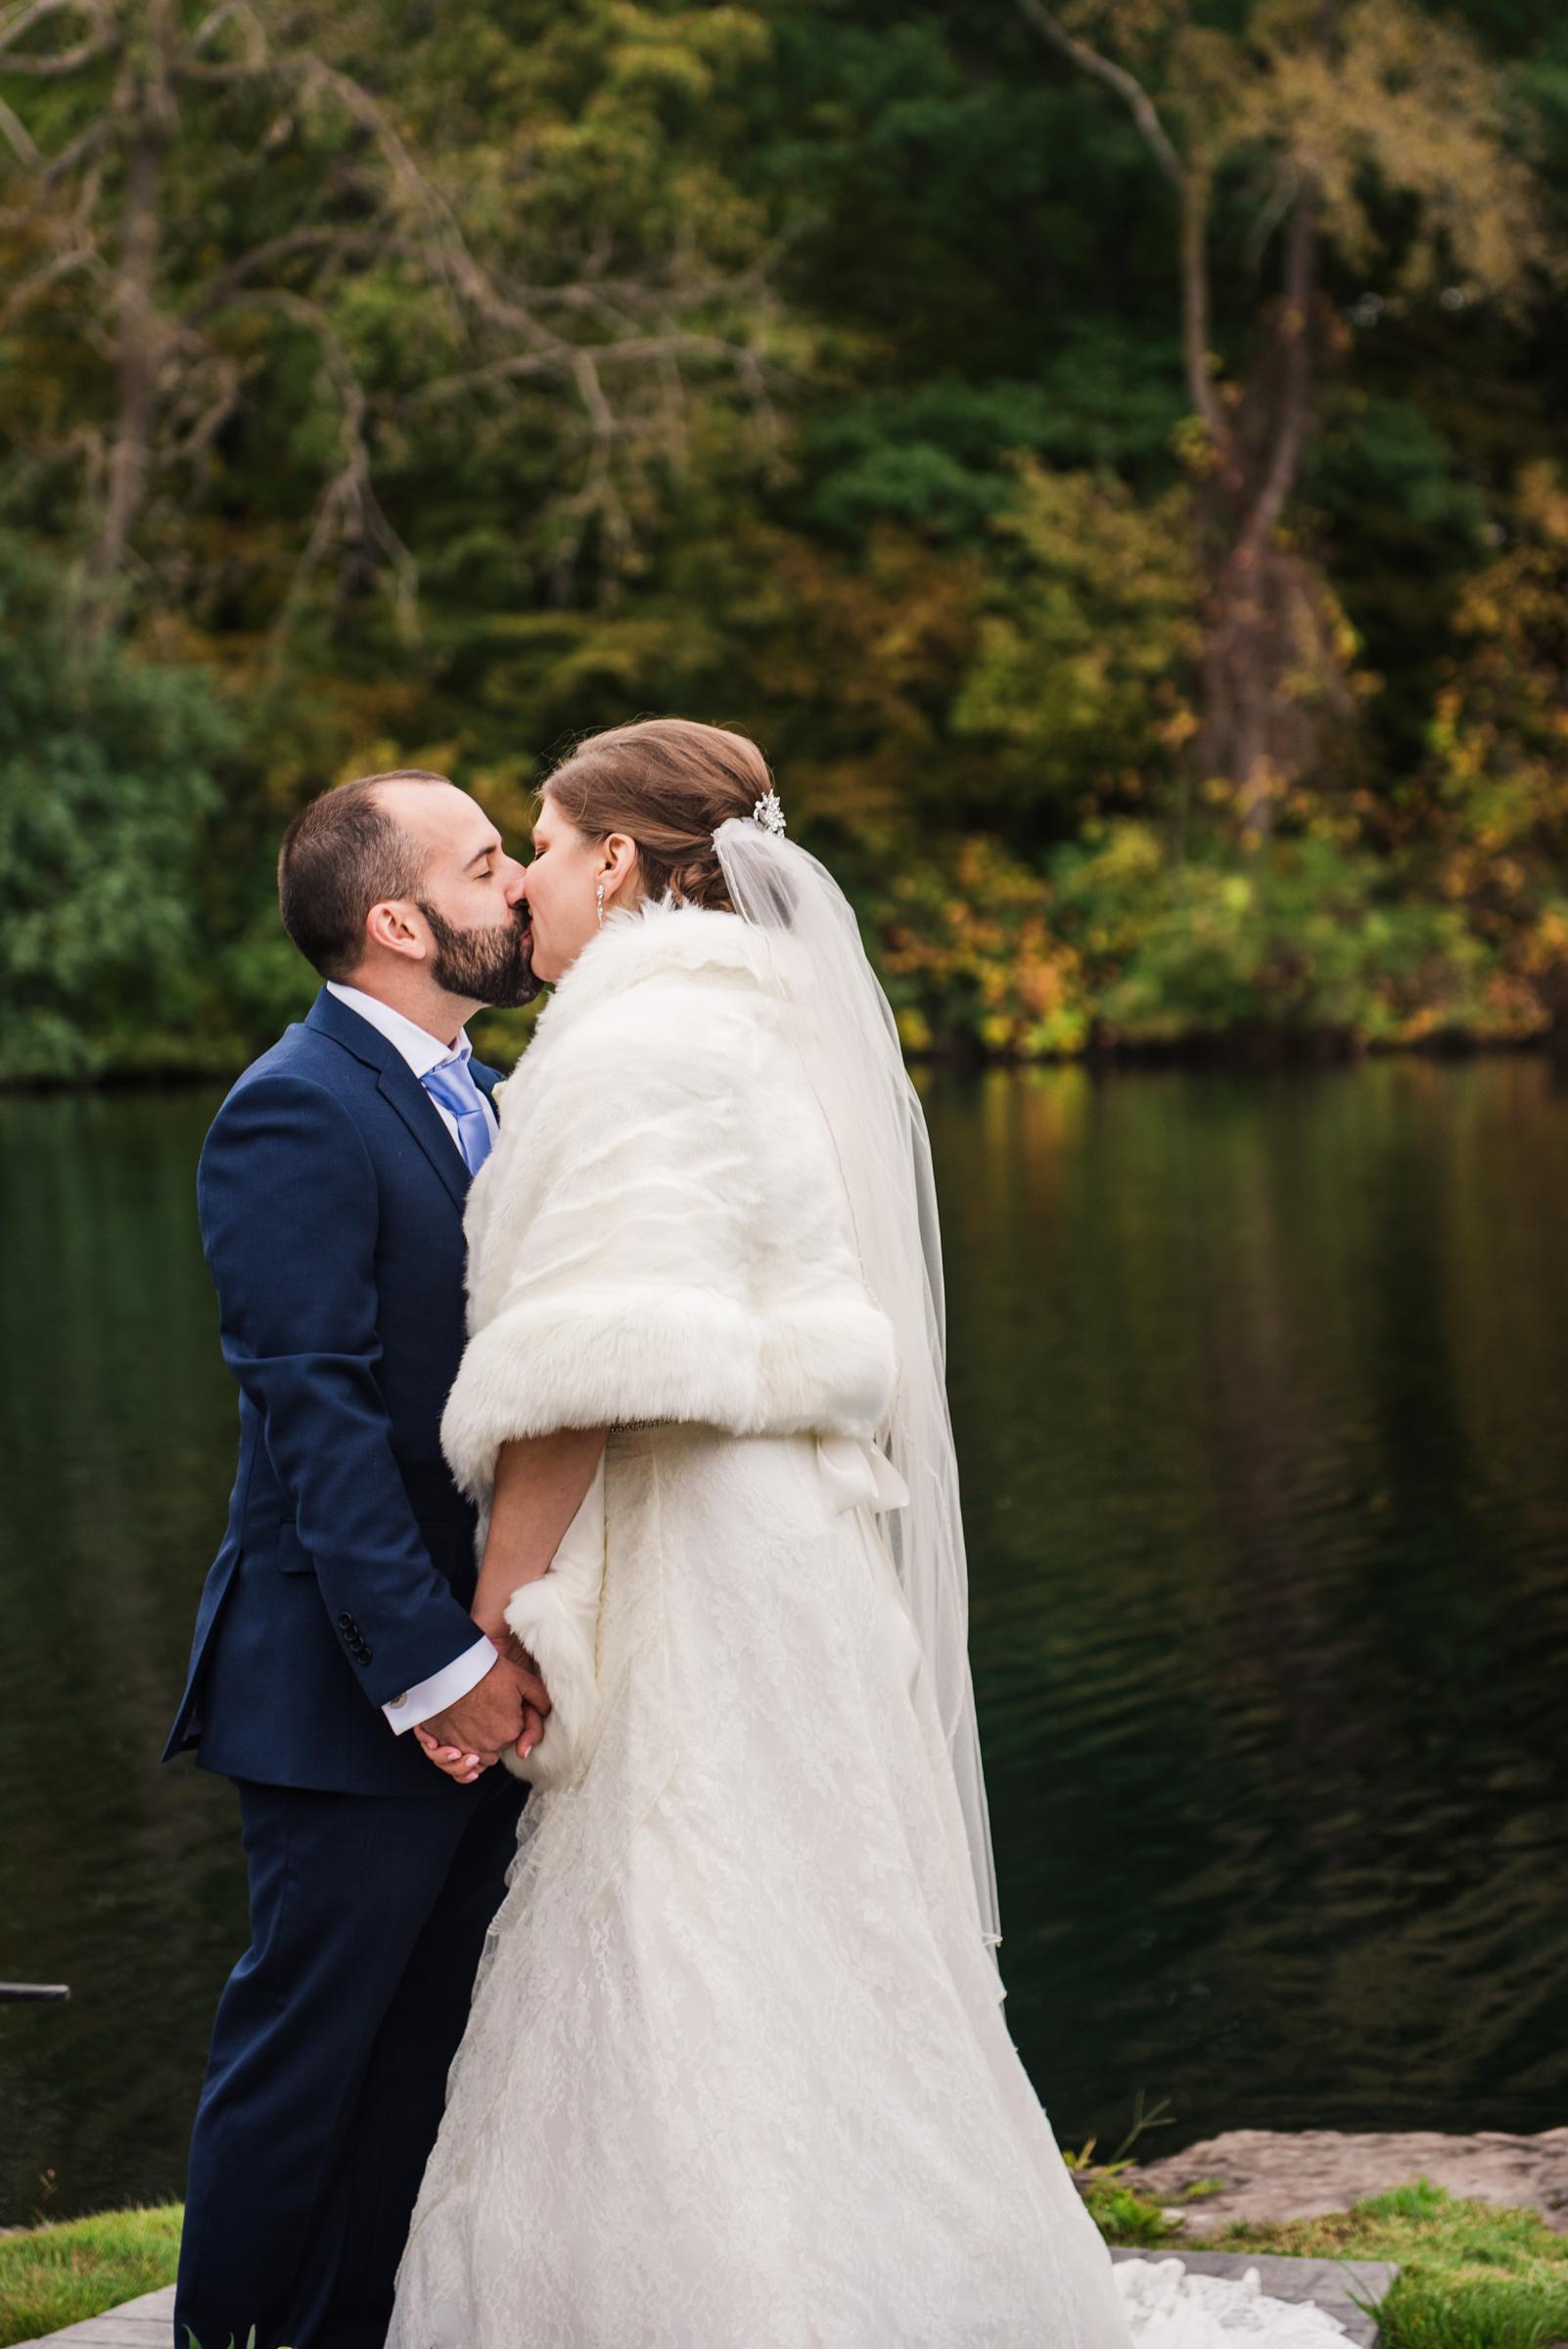 Shadow_Lake_Rochester_Wedding_JILL_STUDIO_Rochester_NY_Photographer_DSC_6009.jpg